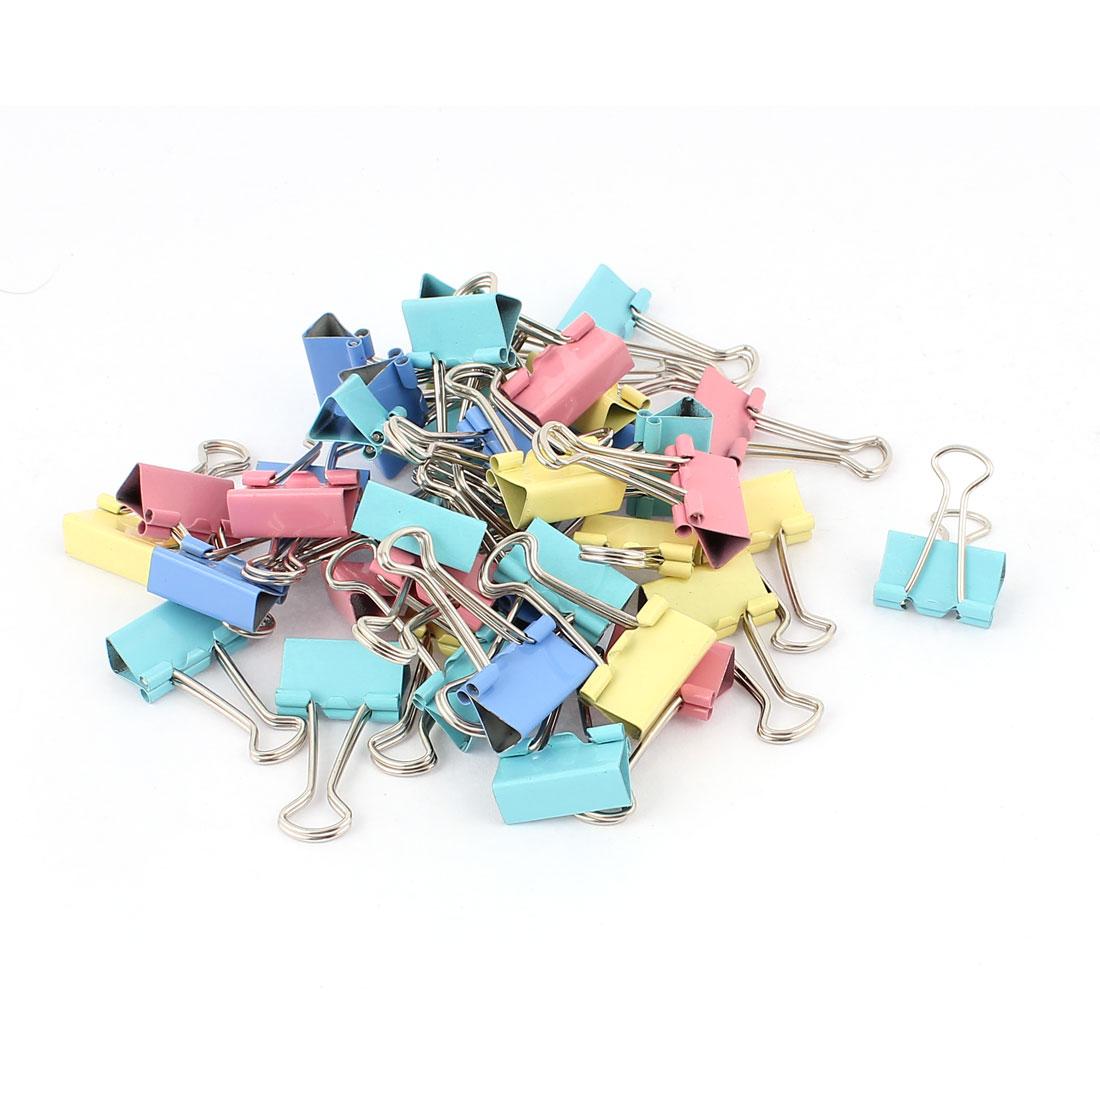 Office 19mm Wide Paper File Ticket Spring Binder Clips Assorted Color 40pcs